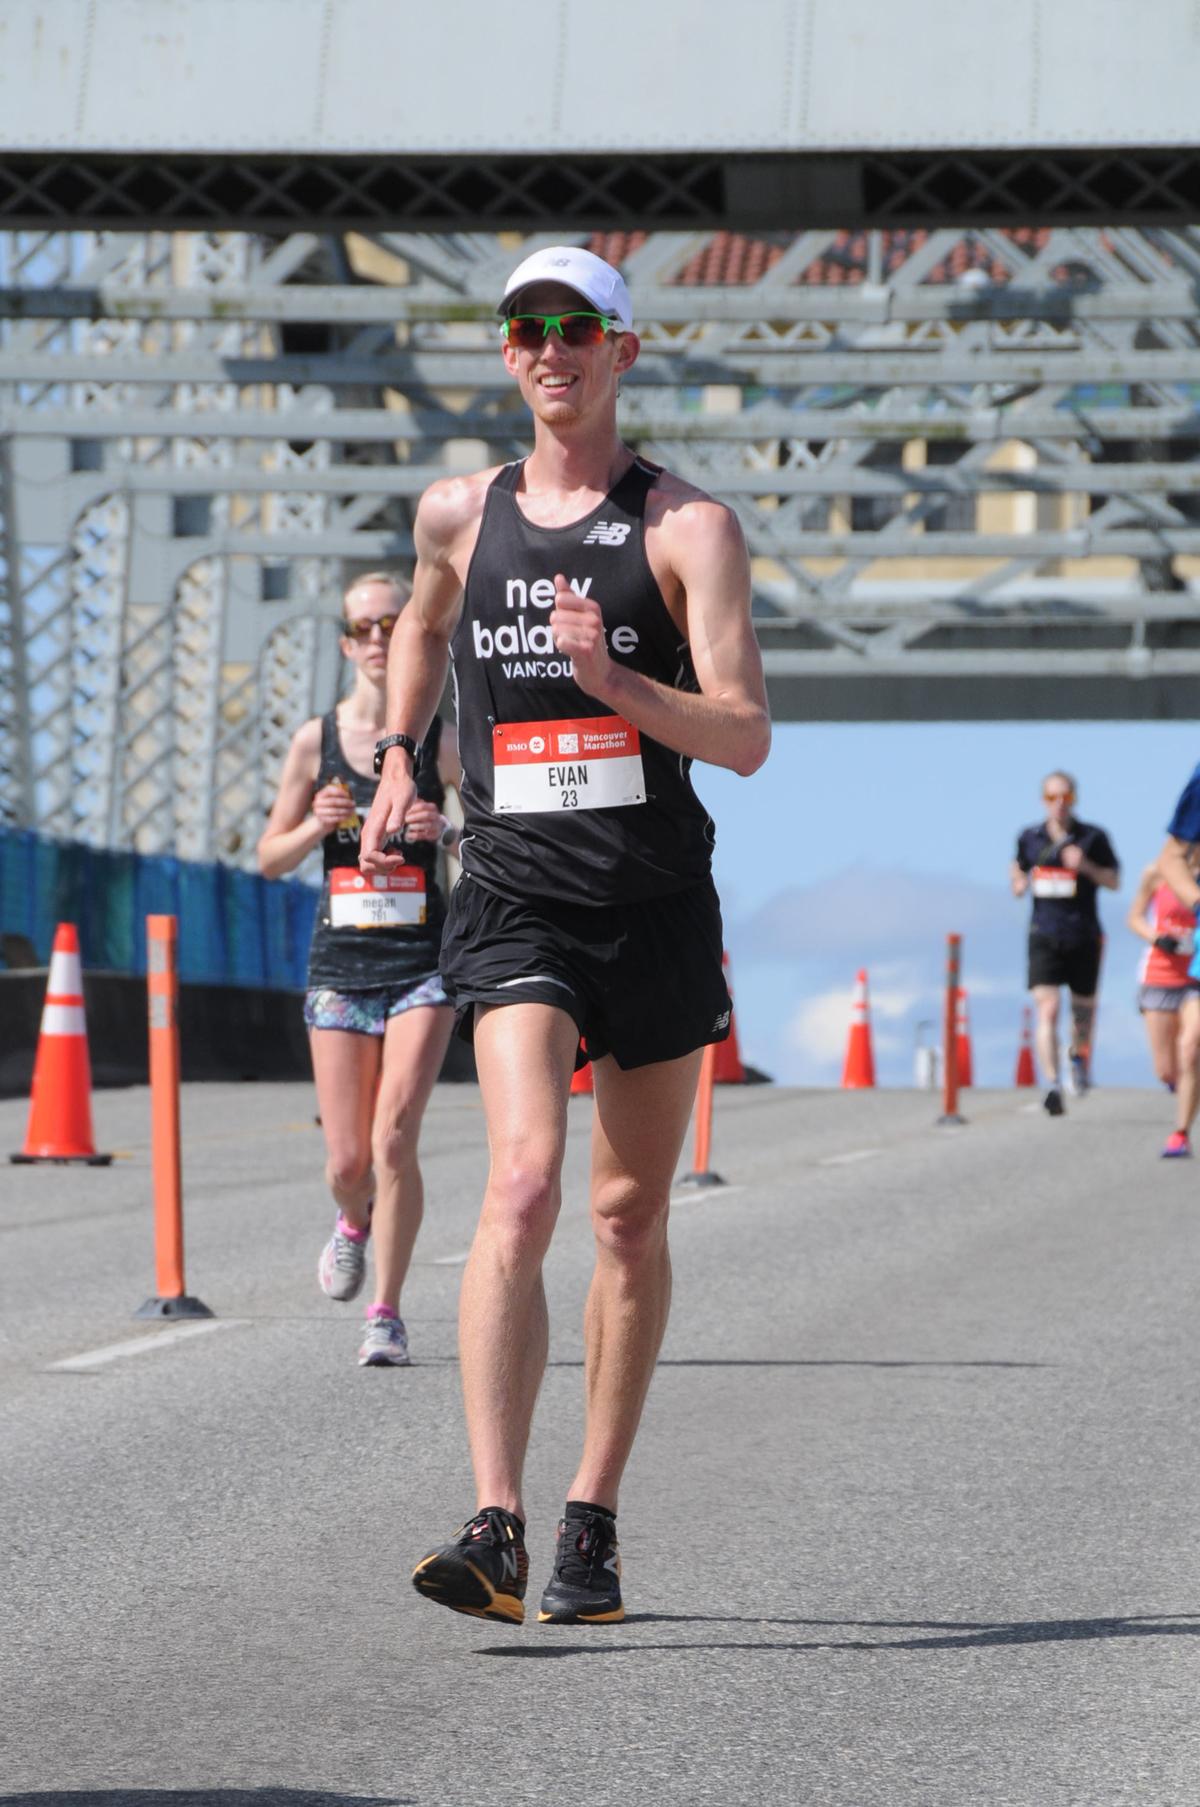 28-2017-EvanDunfee-BurrardBridge-VancouverMarathon-RUNVAN®-MarathonFoto-web